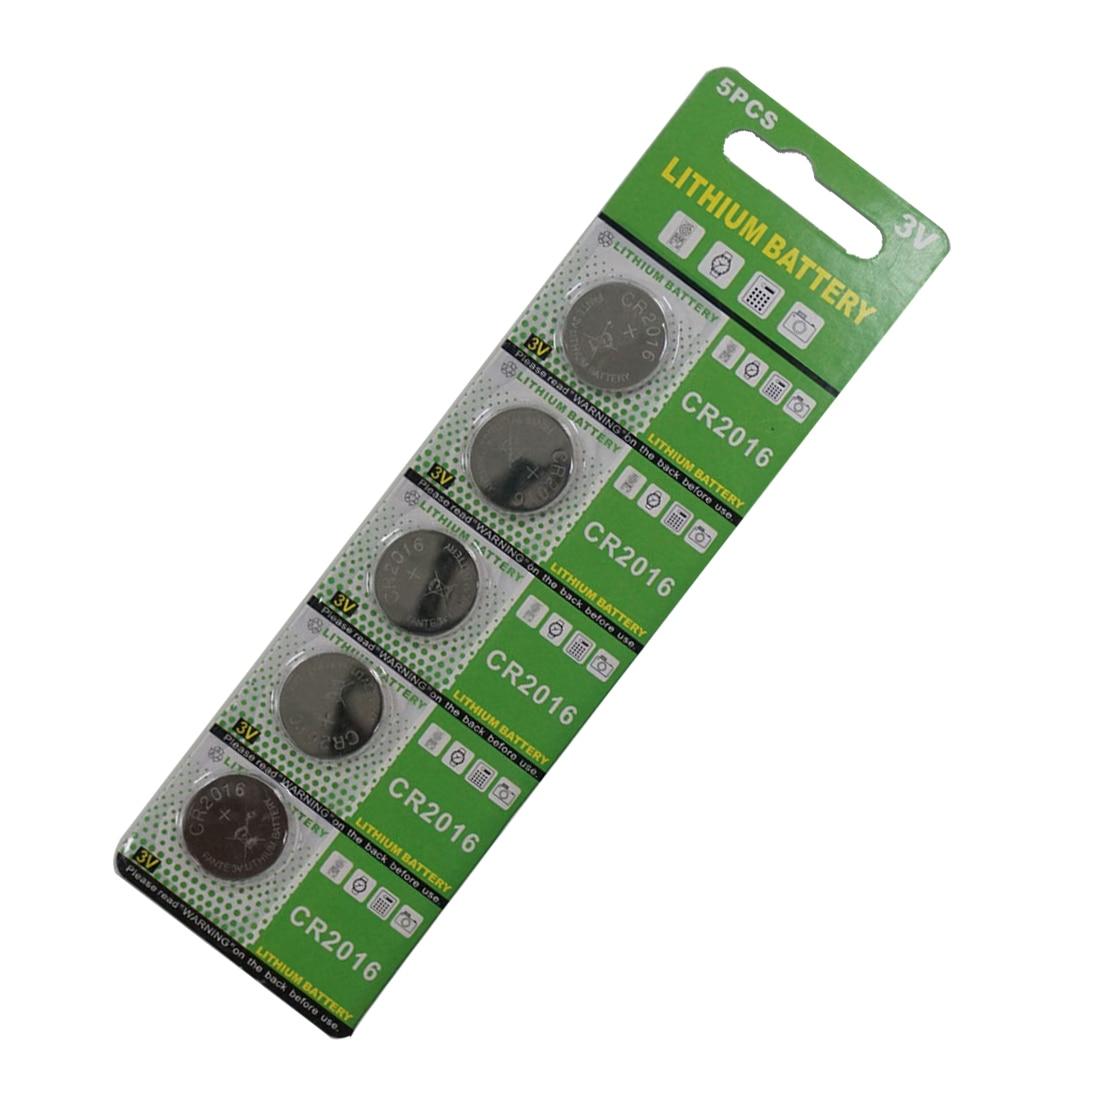 centechia Top quality 20Pcs CR2016 3V Cell Battery Button Battery ,Coin Battery,cr 2016 lithium battery